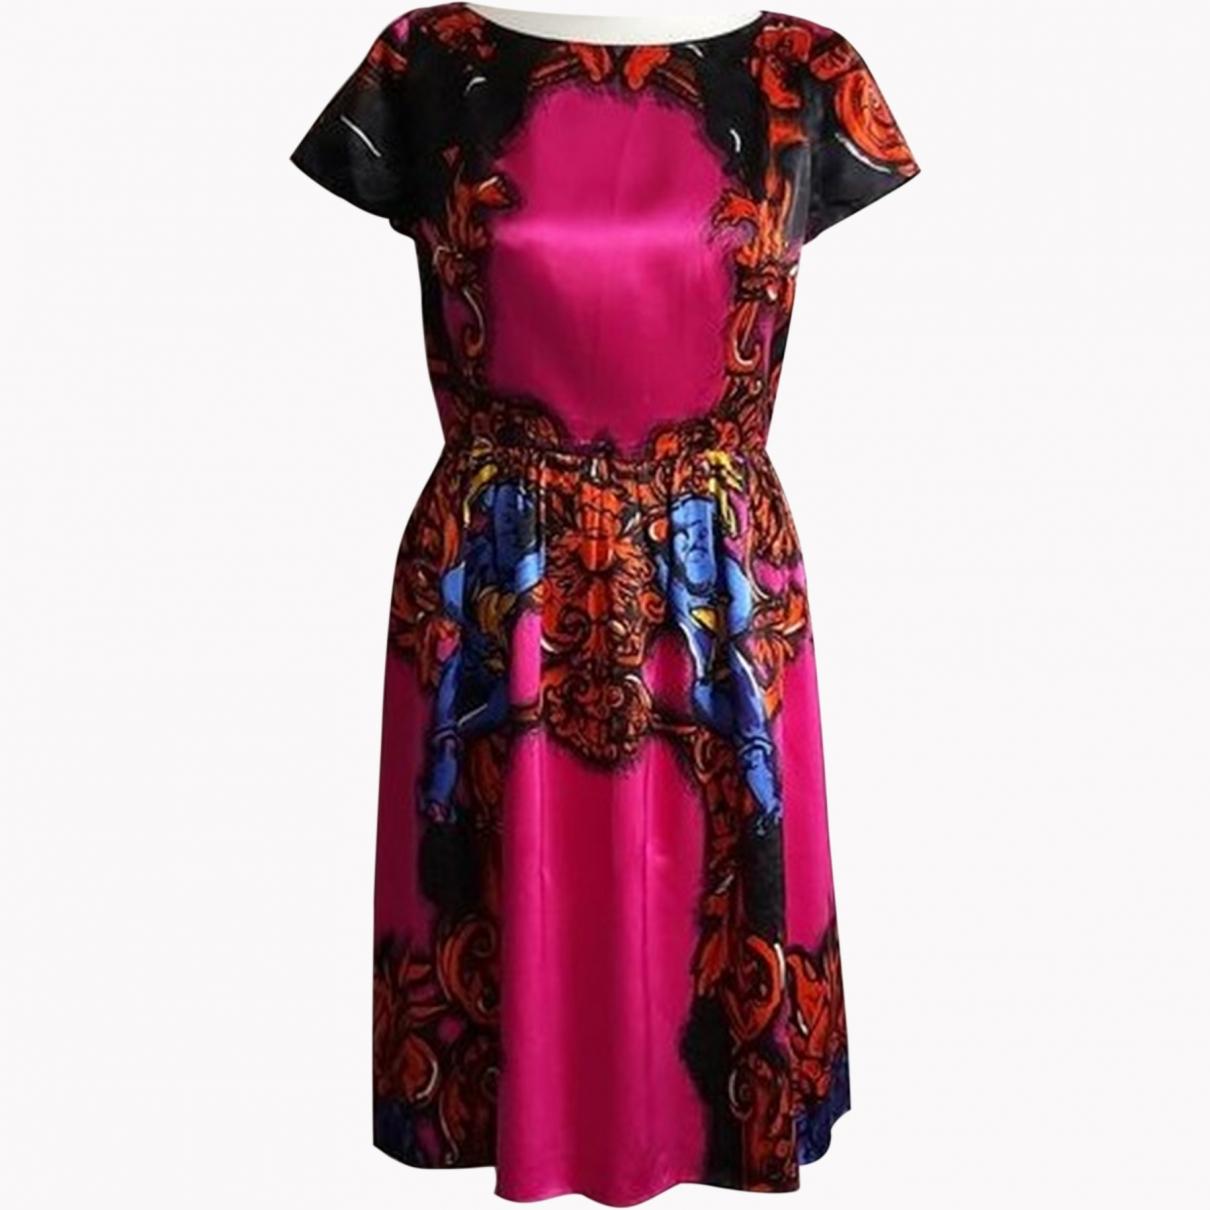 Prada \N Multicolour dress for Women 42 IT